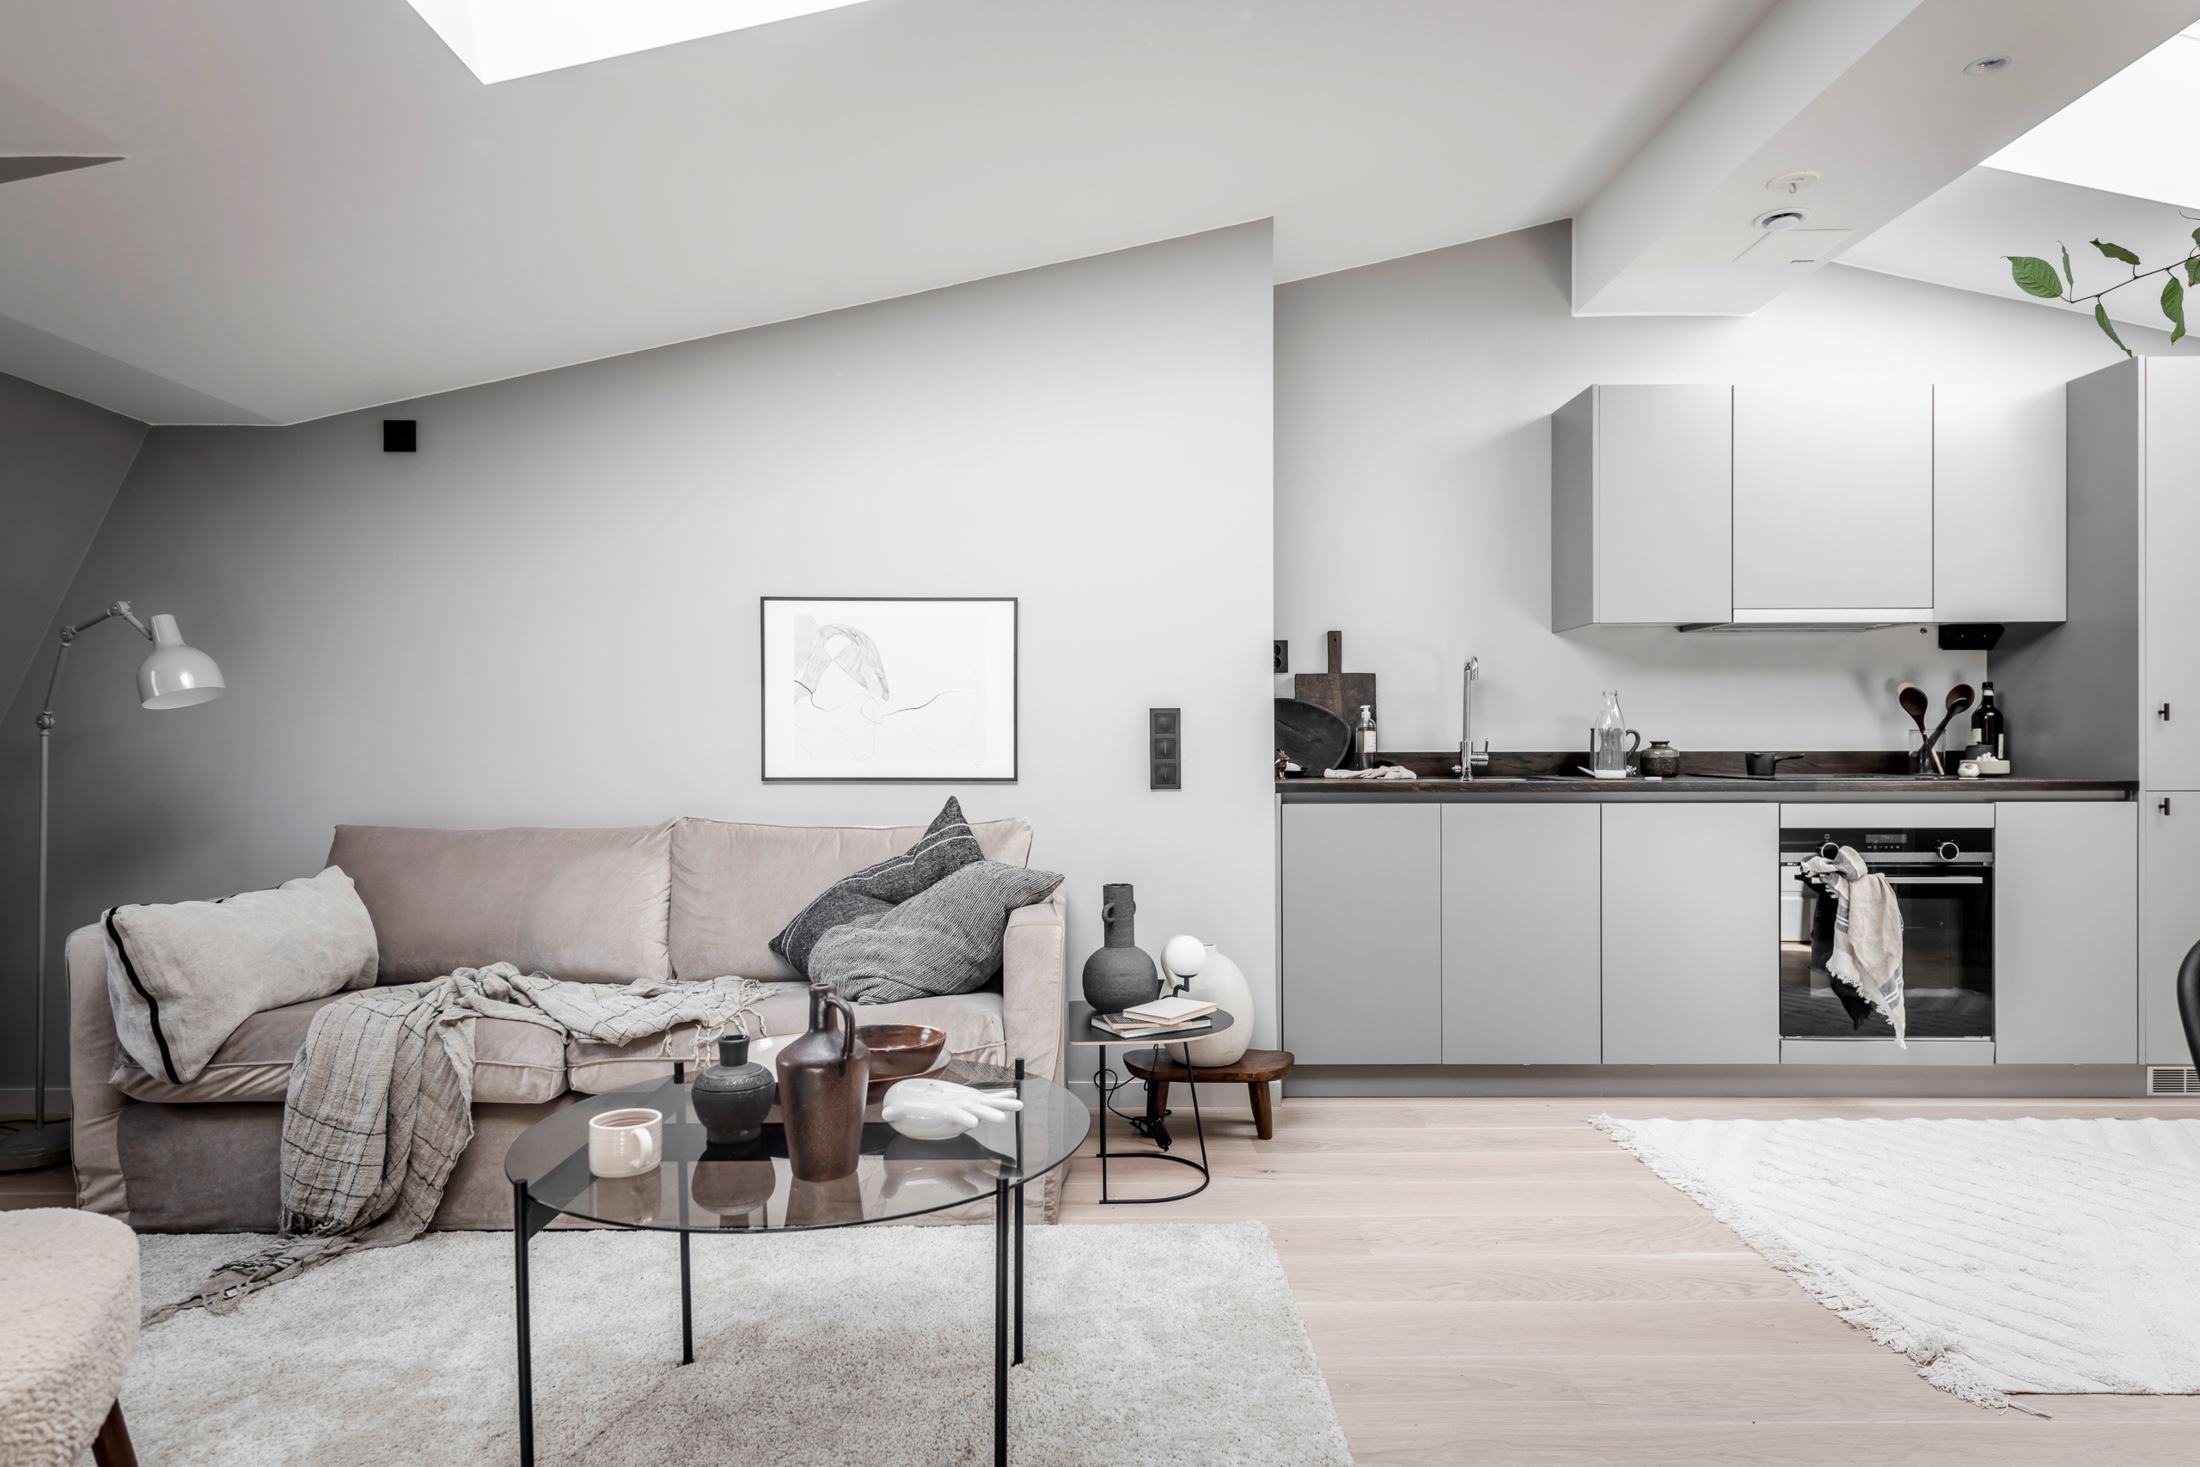 Plan deschis și decor nordic într o garsonieră la mansardă 35 m² 2